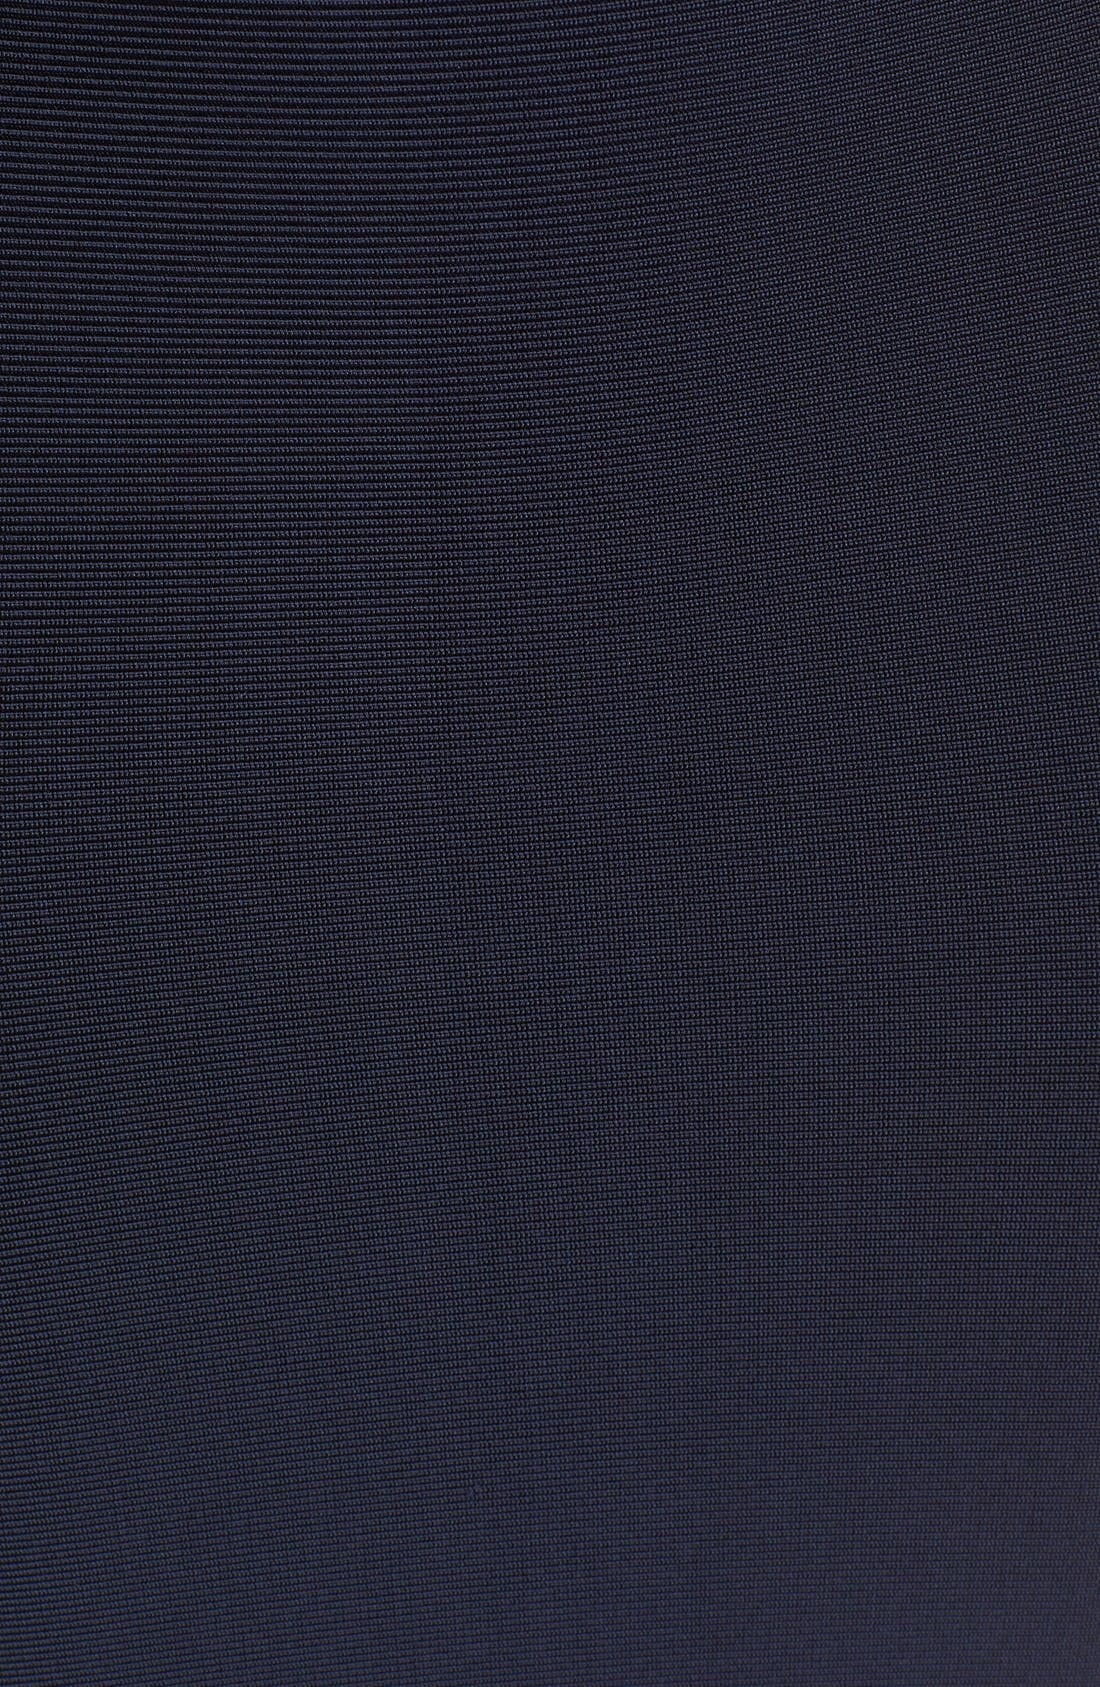 Alternate Image 3  - Herve Leger Openwork Diamond Trim Bandage Dress